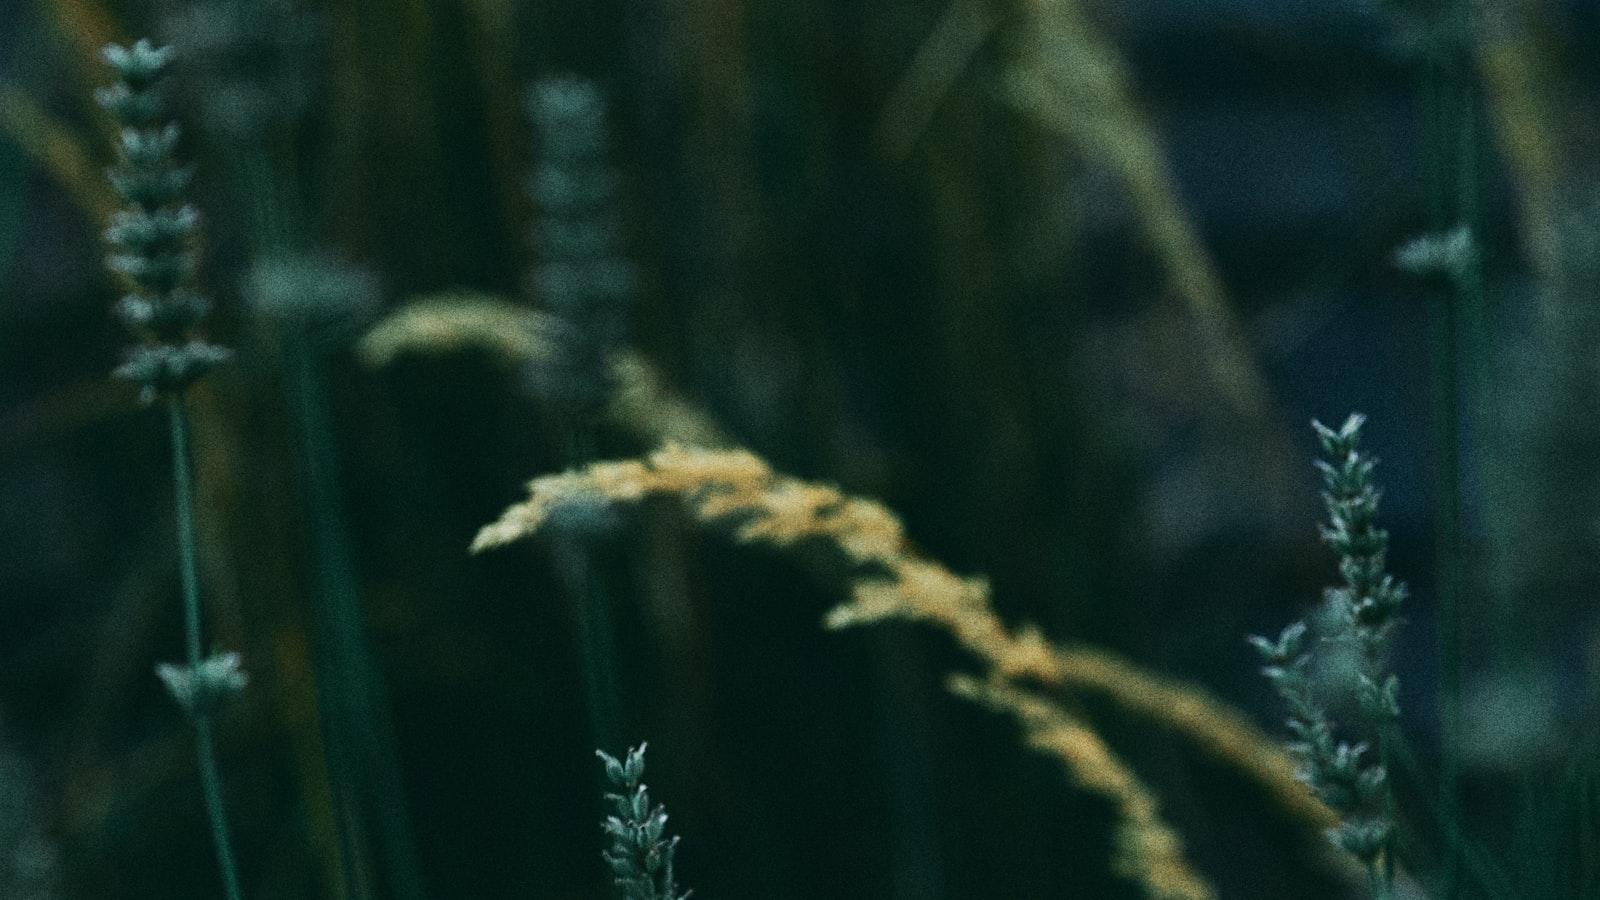 DENSE SHADE GRASS SEED